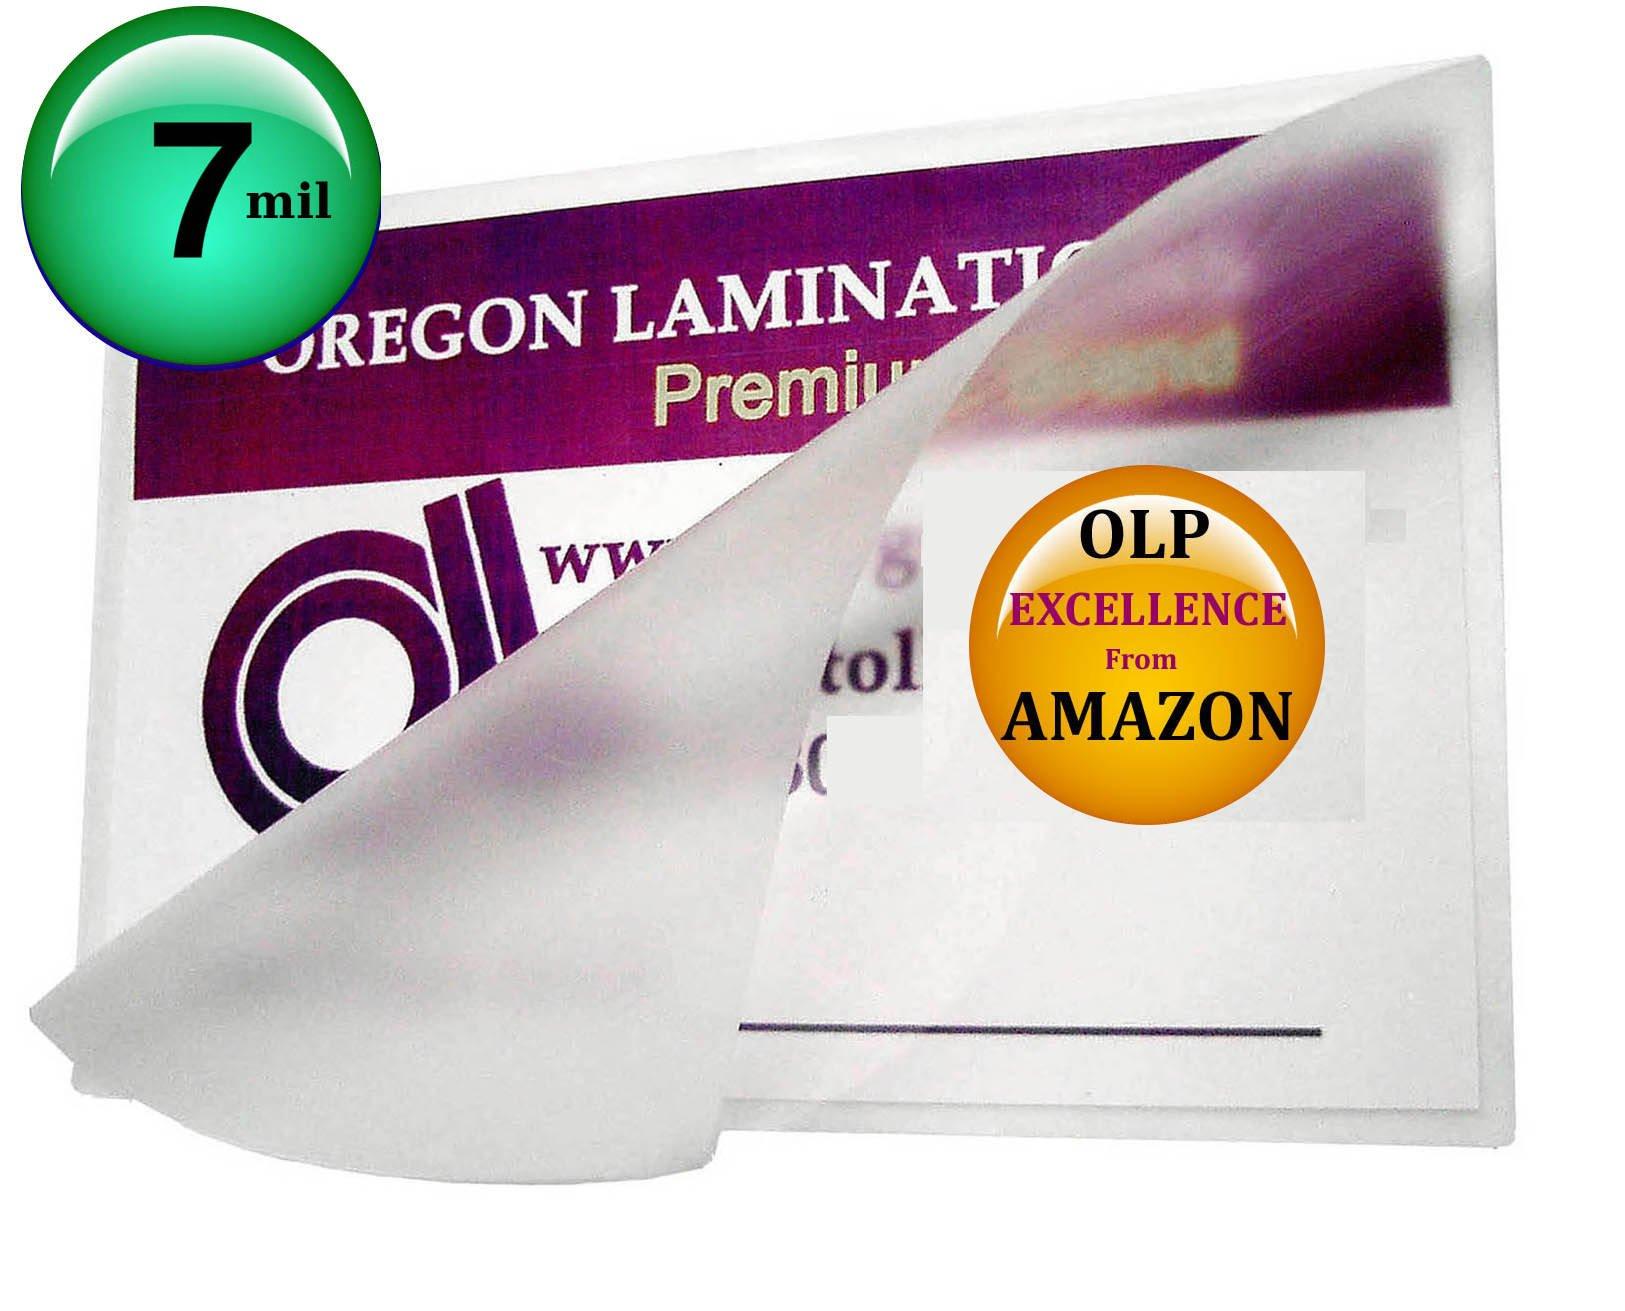 7 Mil Mini Menu Laminating Pouches 11-1/4 x 17-1/4 Laminator Sleeves qty 100 by Oregon Lamination Premium